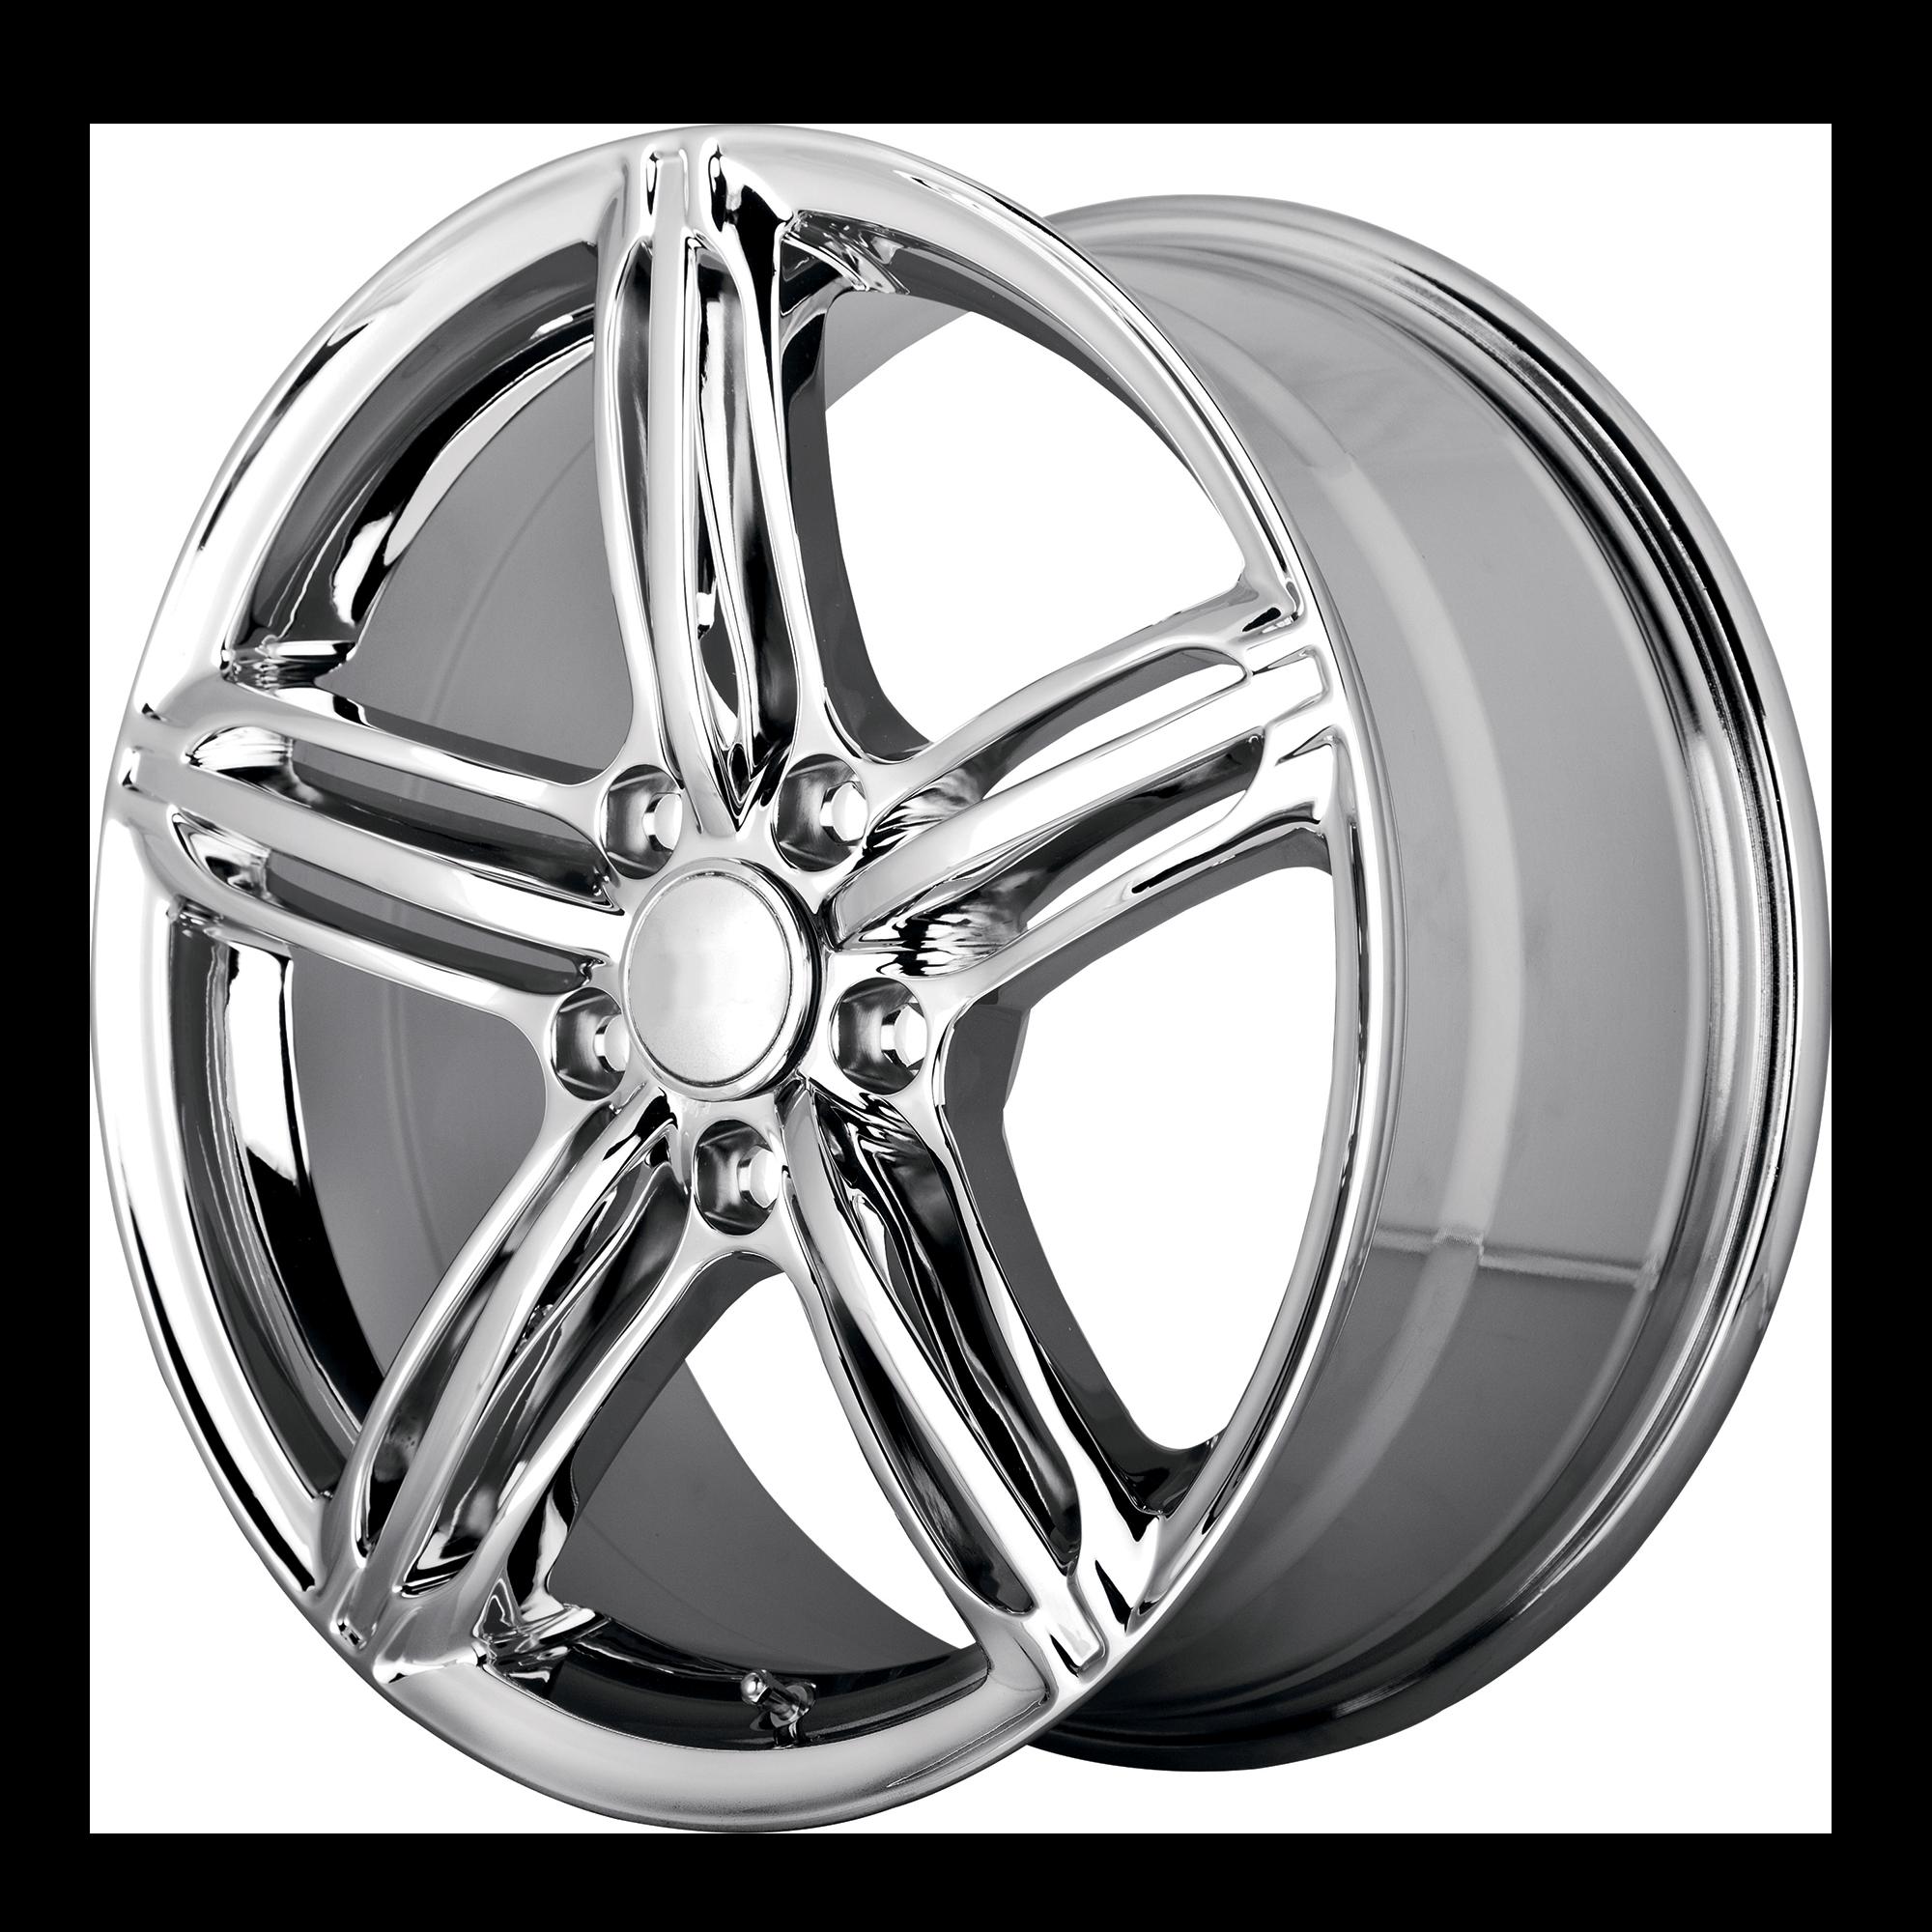 OE Creations Replica Wheels OE Creations PR145 Chrome